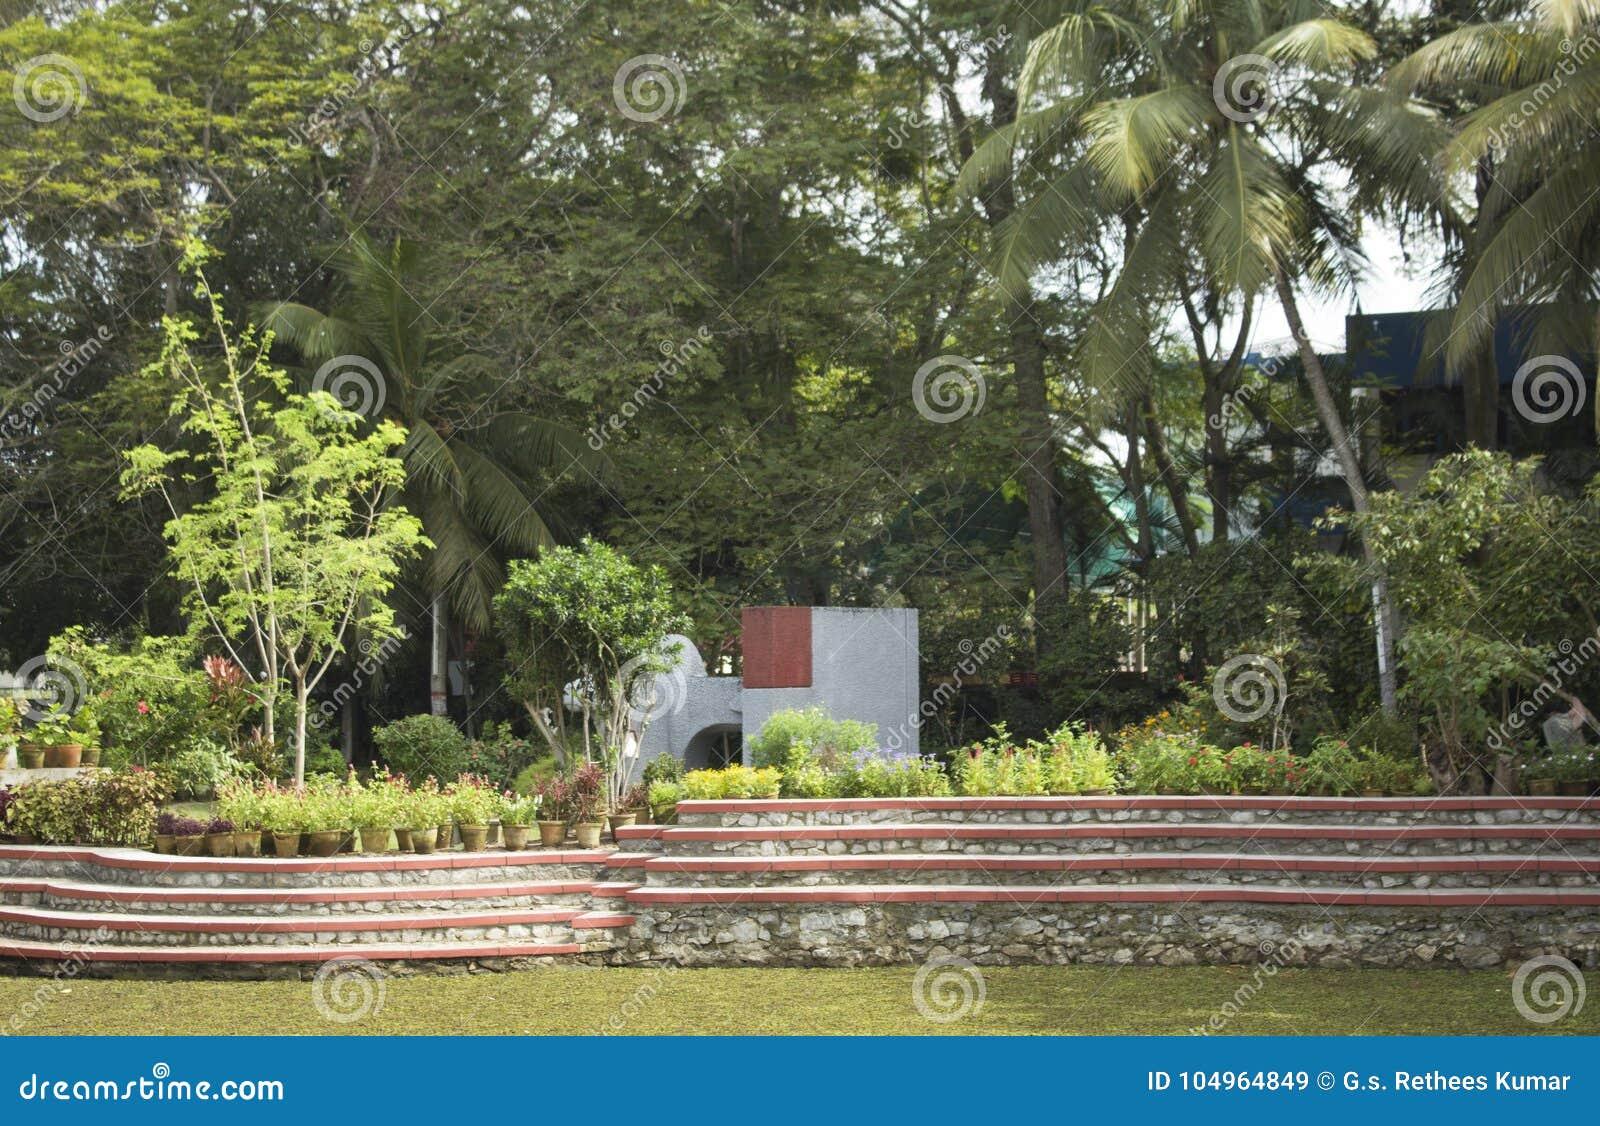 Surprising Veli Tourism Village Resort Garden In Kerala India 6 Bralicious Painted Fabric Chair Ideas Braliciousco